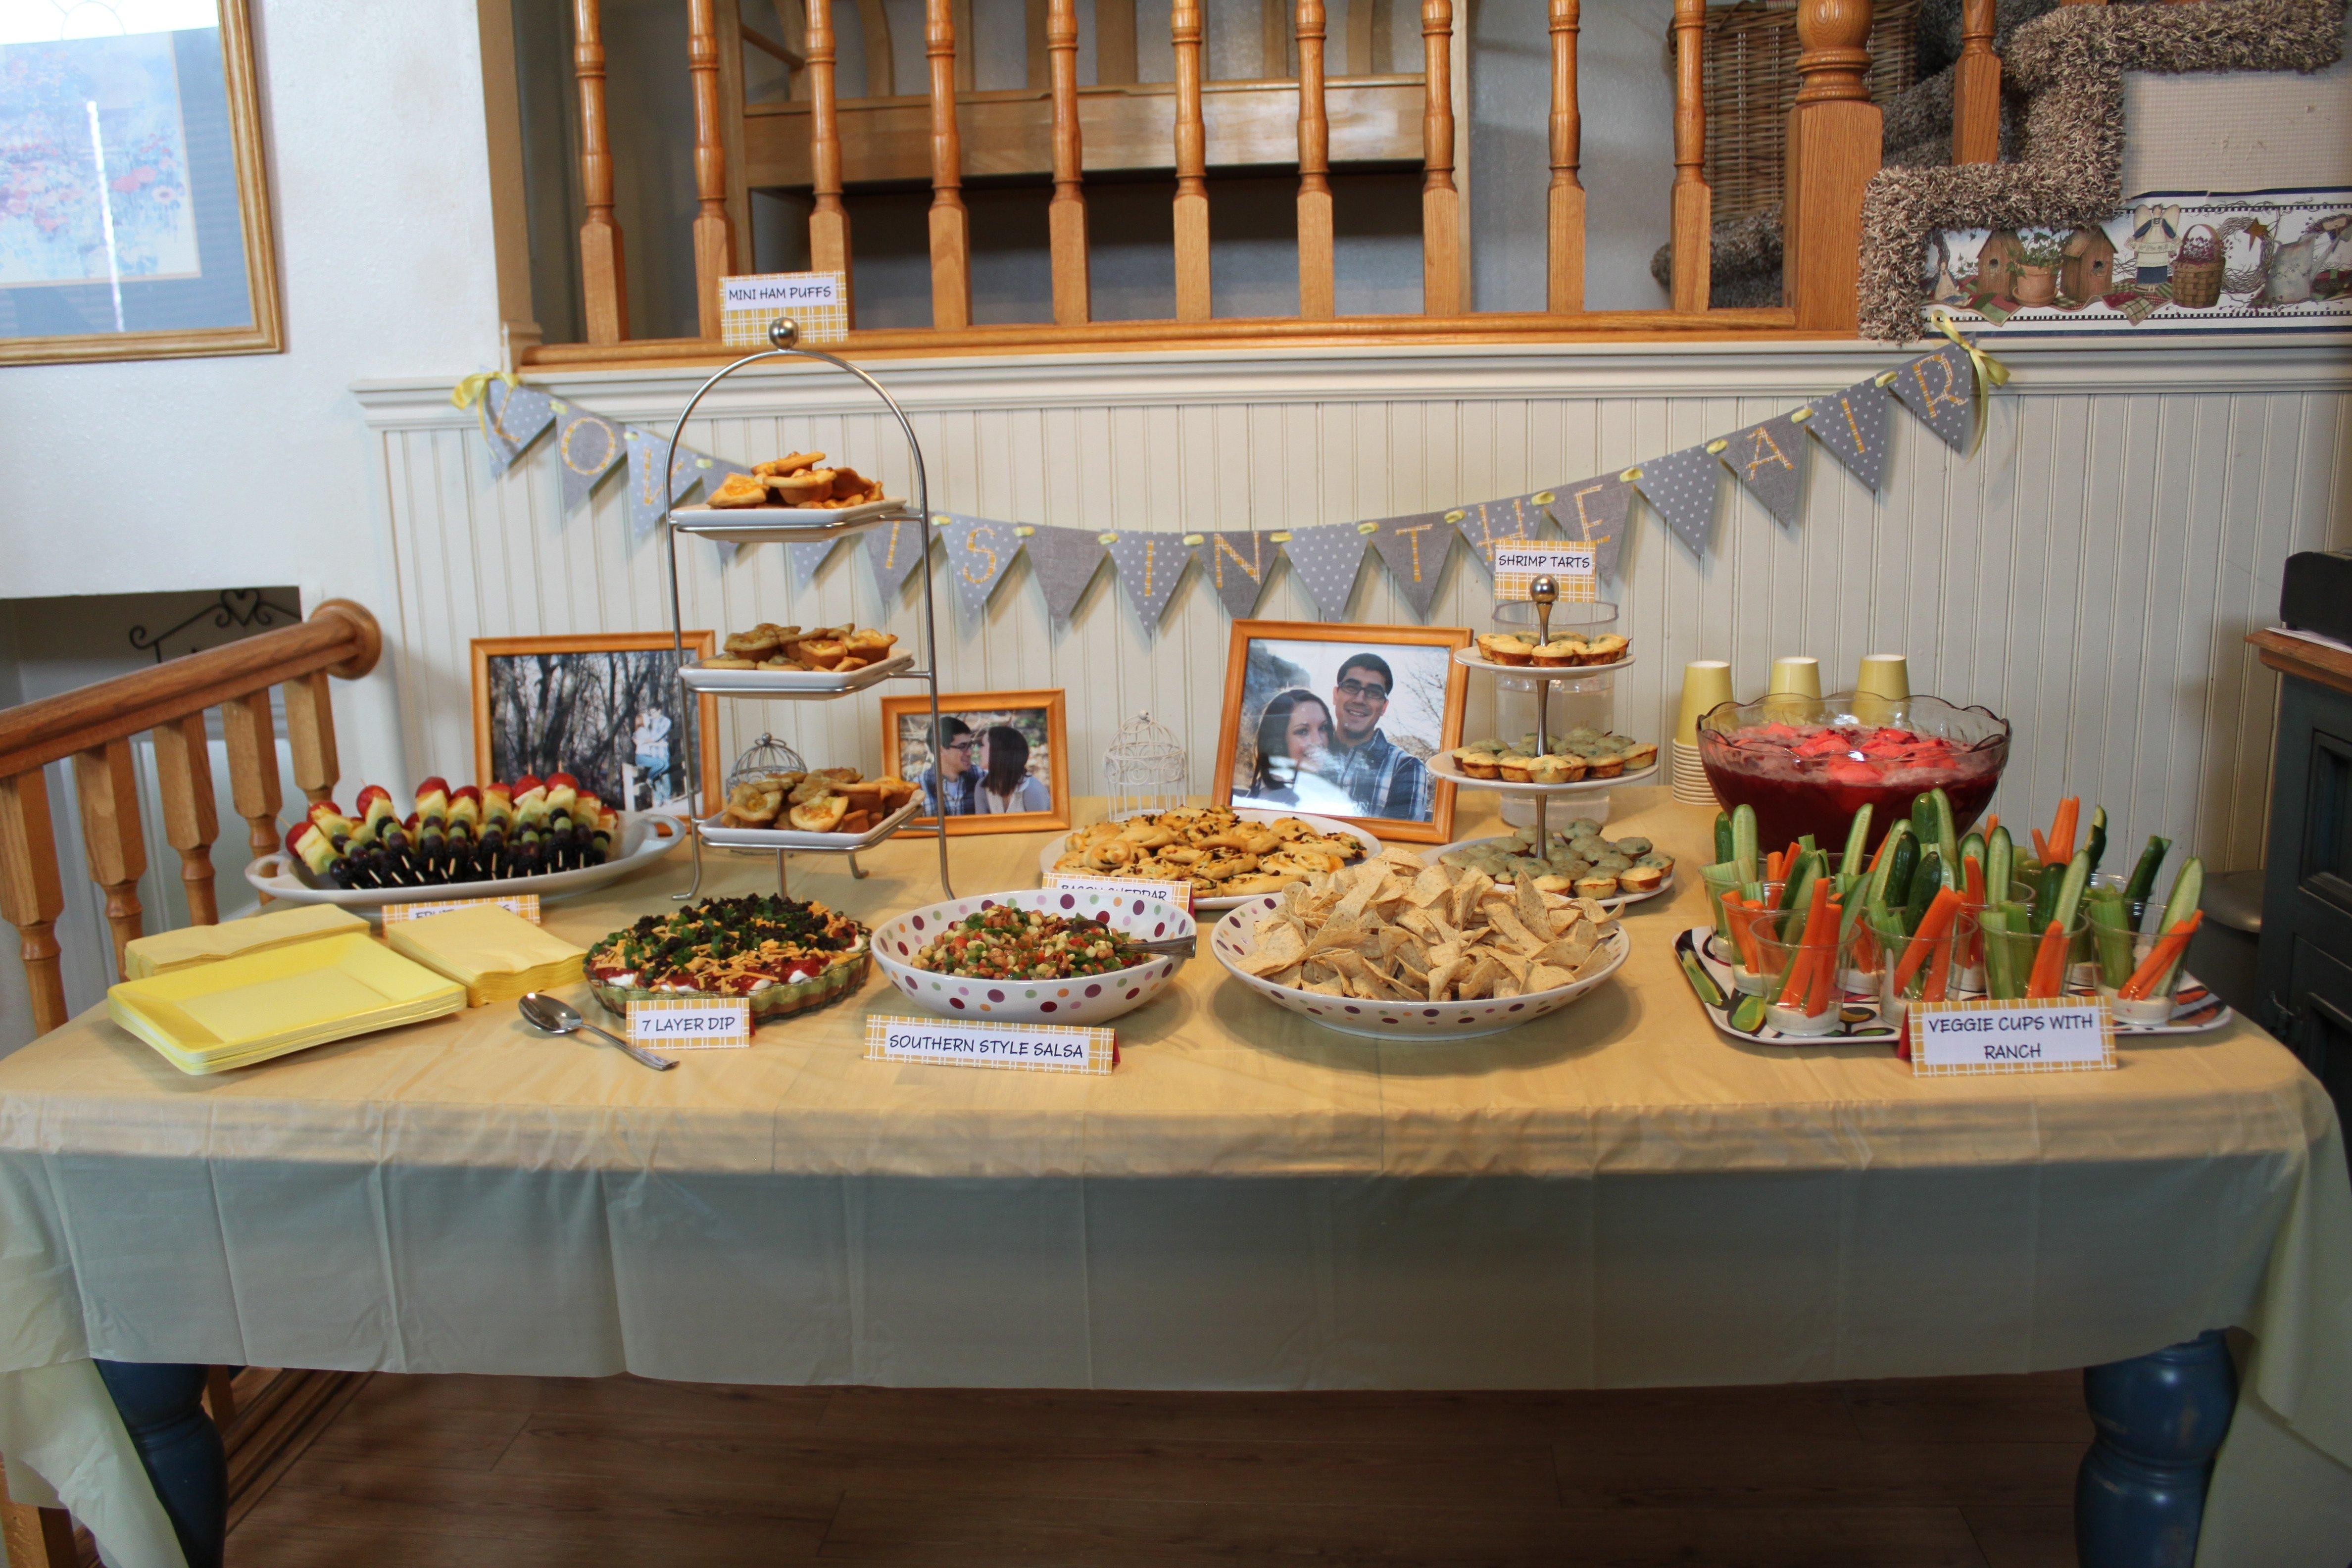 10 Cute Creative Bridal Shower Food Ideas courtneys bridal shower food pennys food blog 1 2020